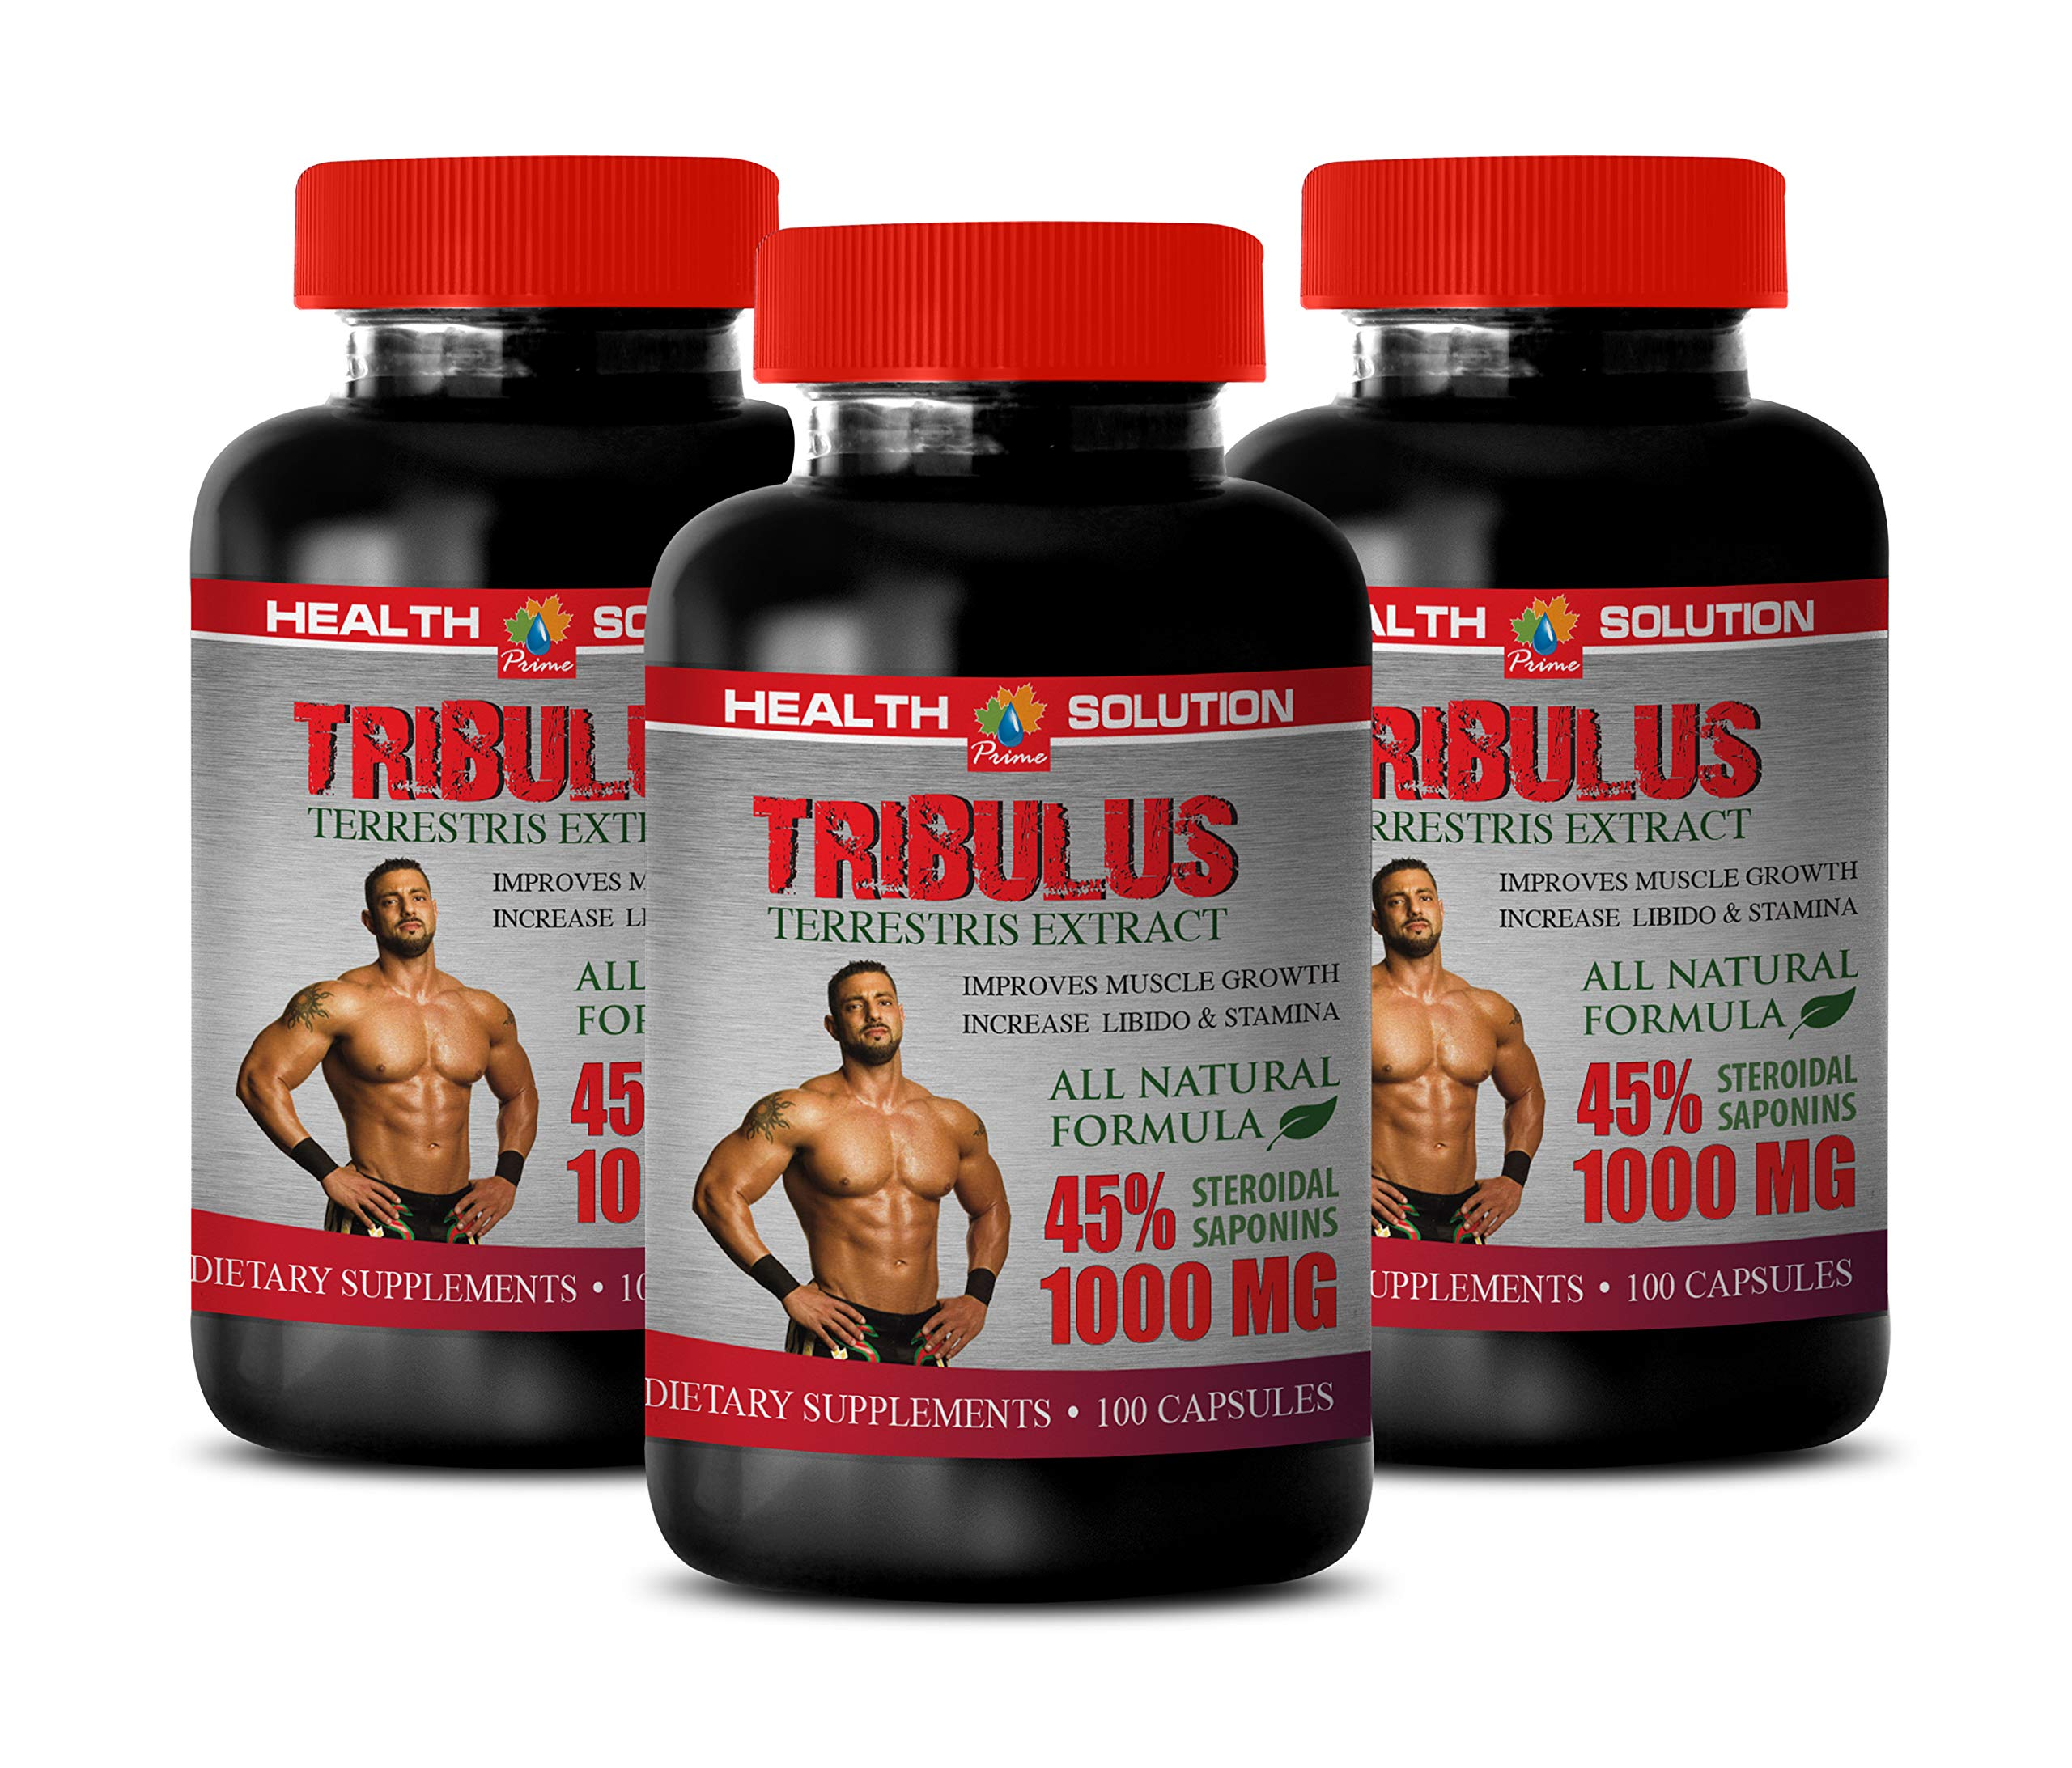 Muscle gain Supplements - TRIBULUS TERRESTRIS 1000MG - 45% STEROIDAL SAPONINS - tribulus Ultra - 3 Bottles (300 Capsules)